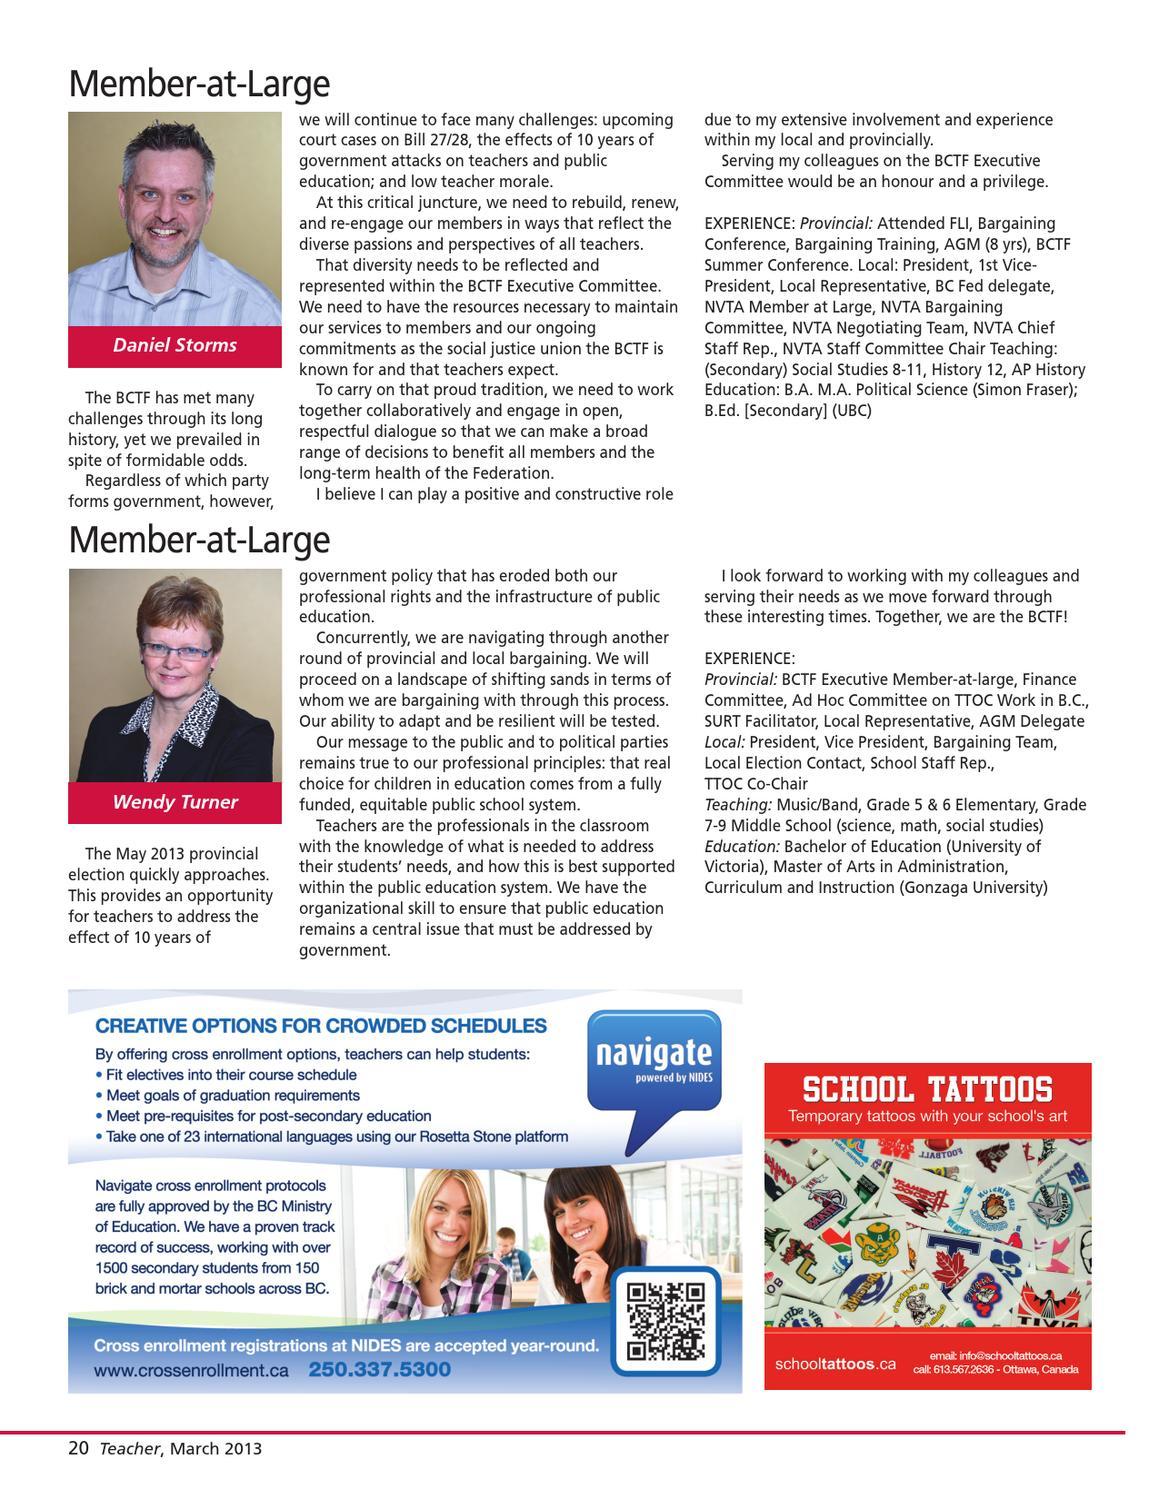 Teacher Newsmagazine March 2013